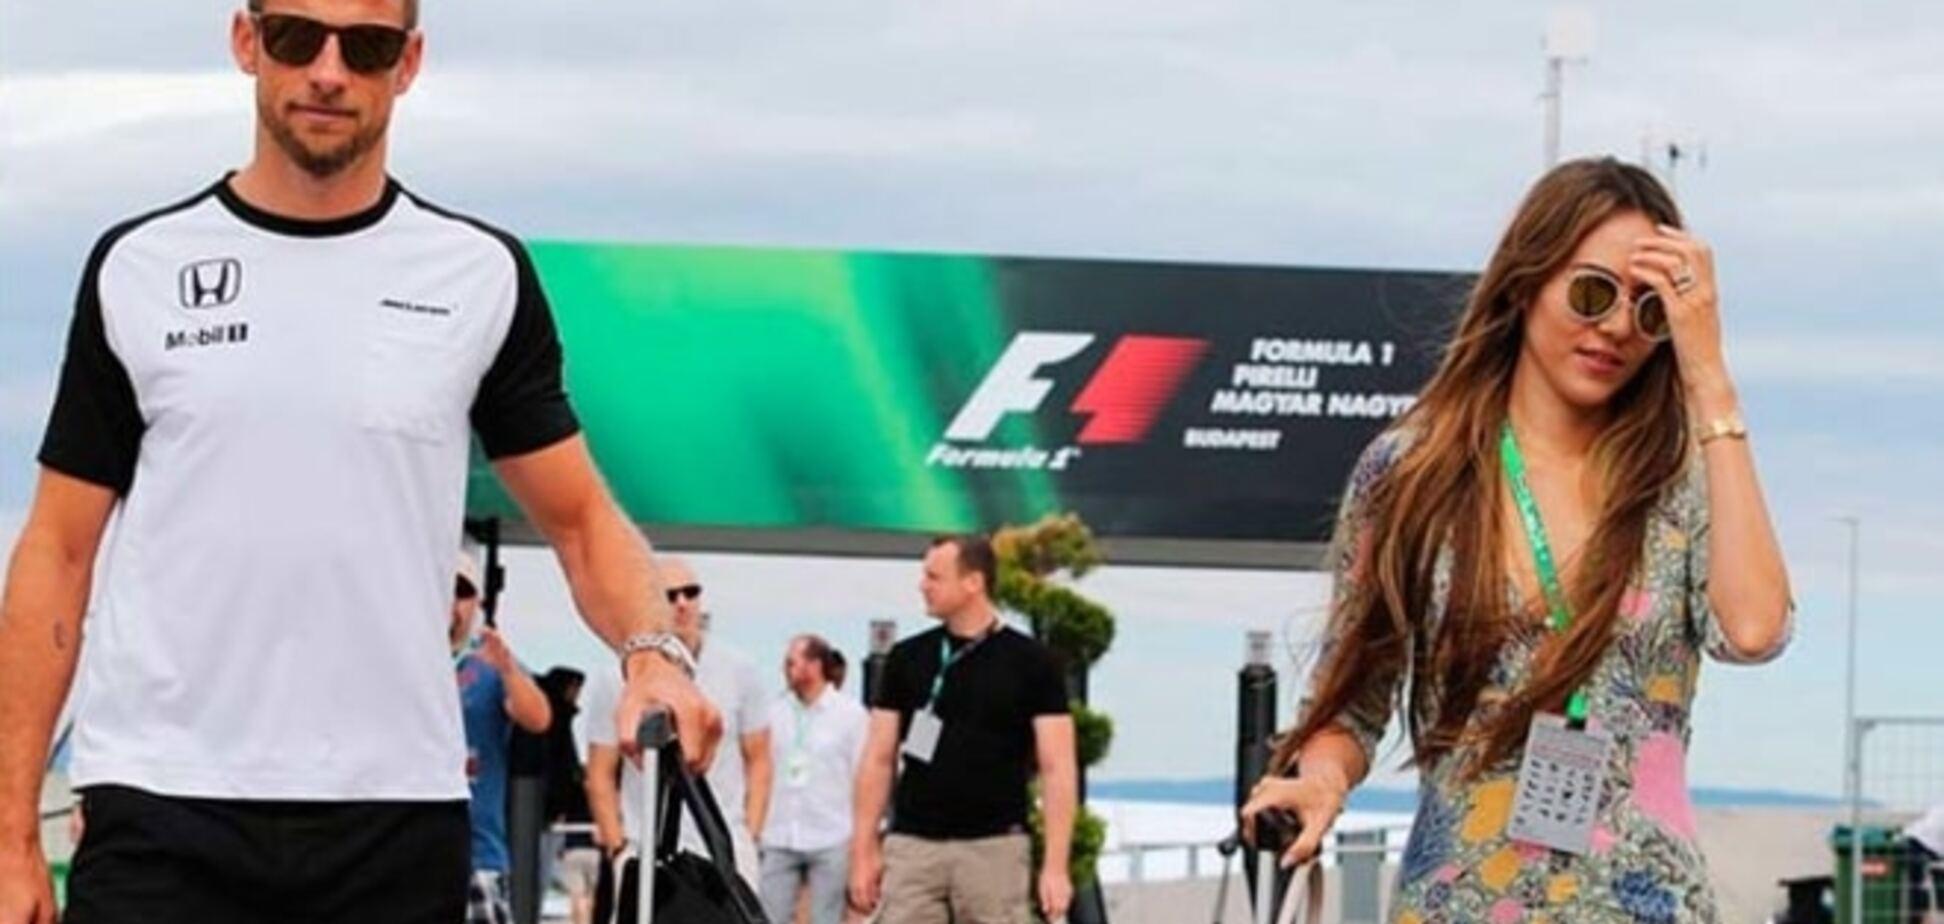 Во Франции дерзко ограбили звезду Формулы-1